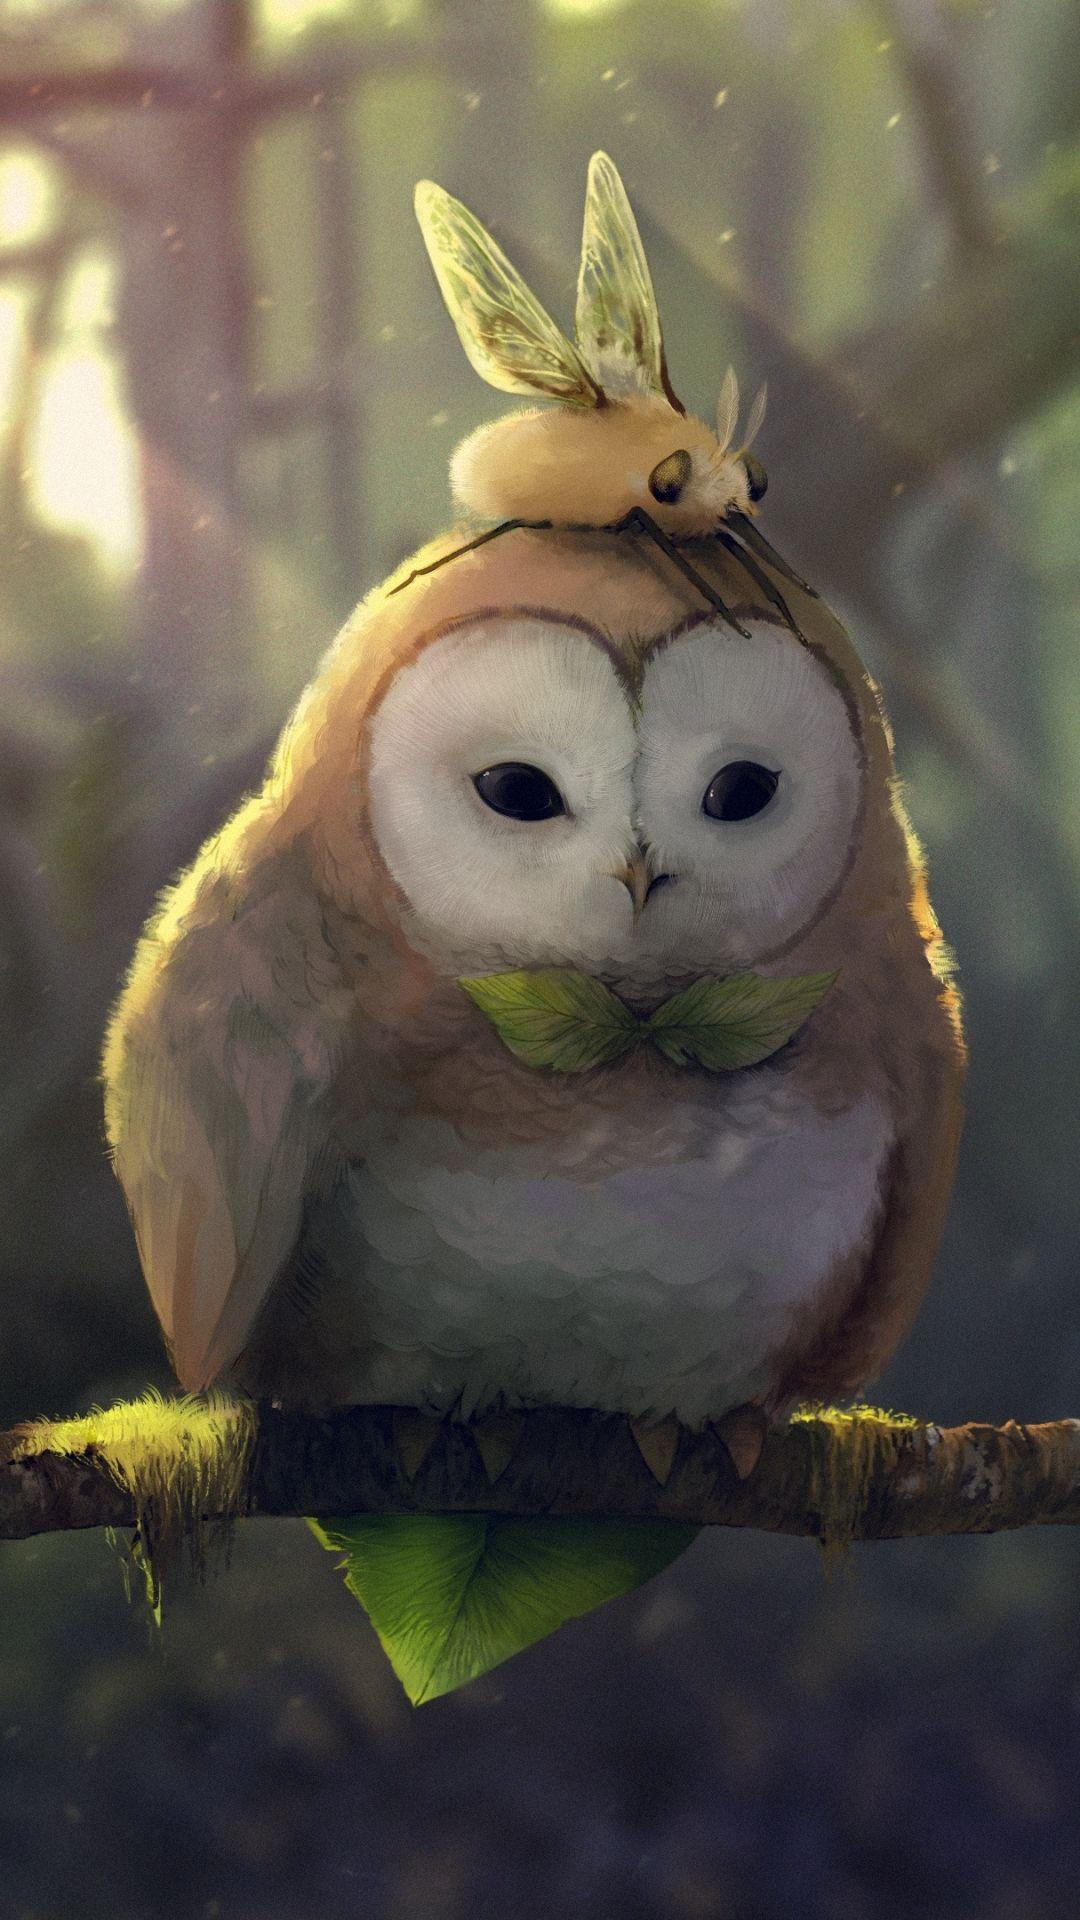 Fantasy Owl 1080x1920 Mobile Wallpaper Owl Wallpaper Owl Pictures Animal Wallpaper